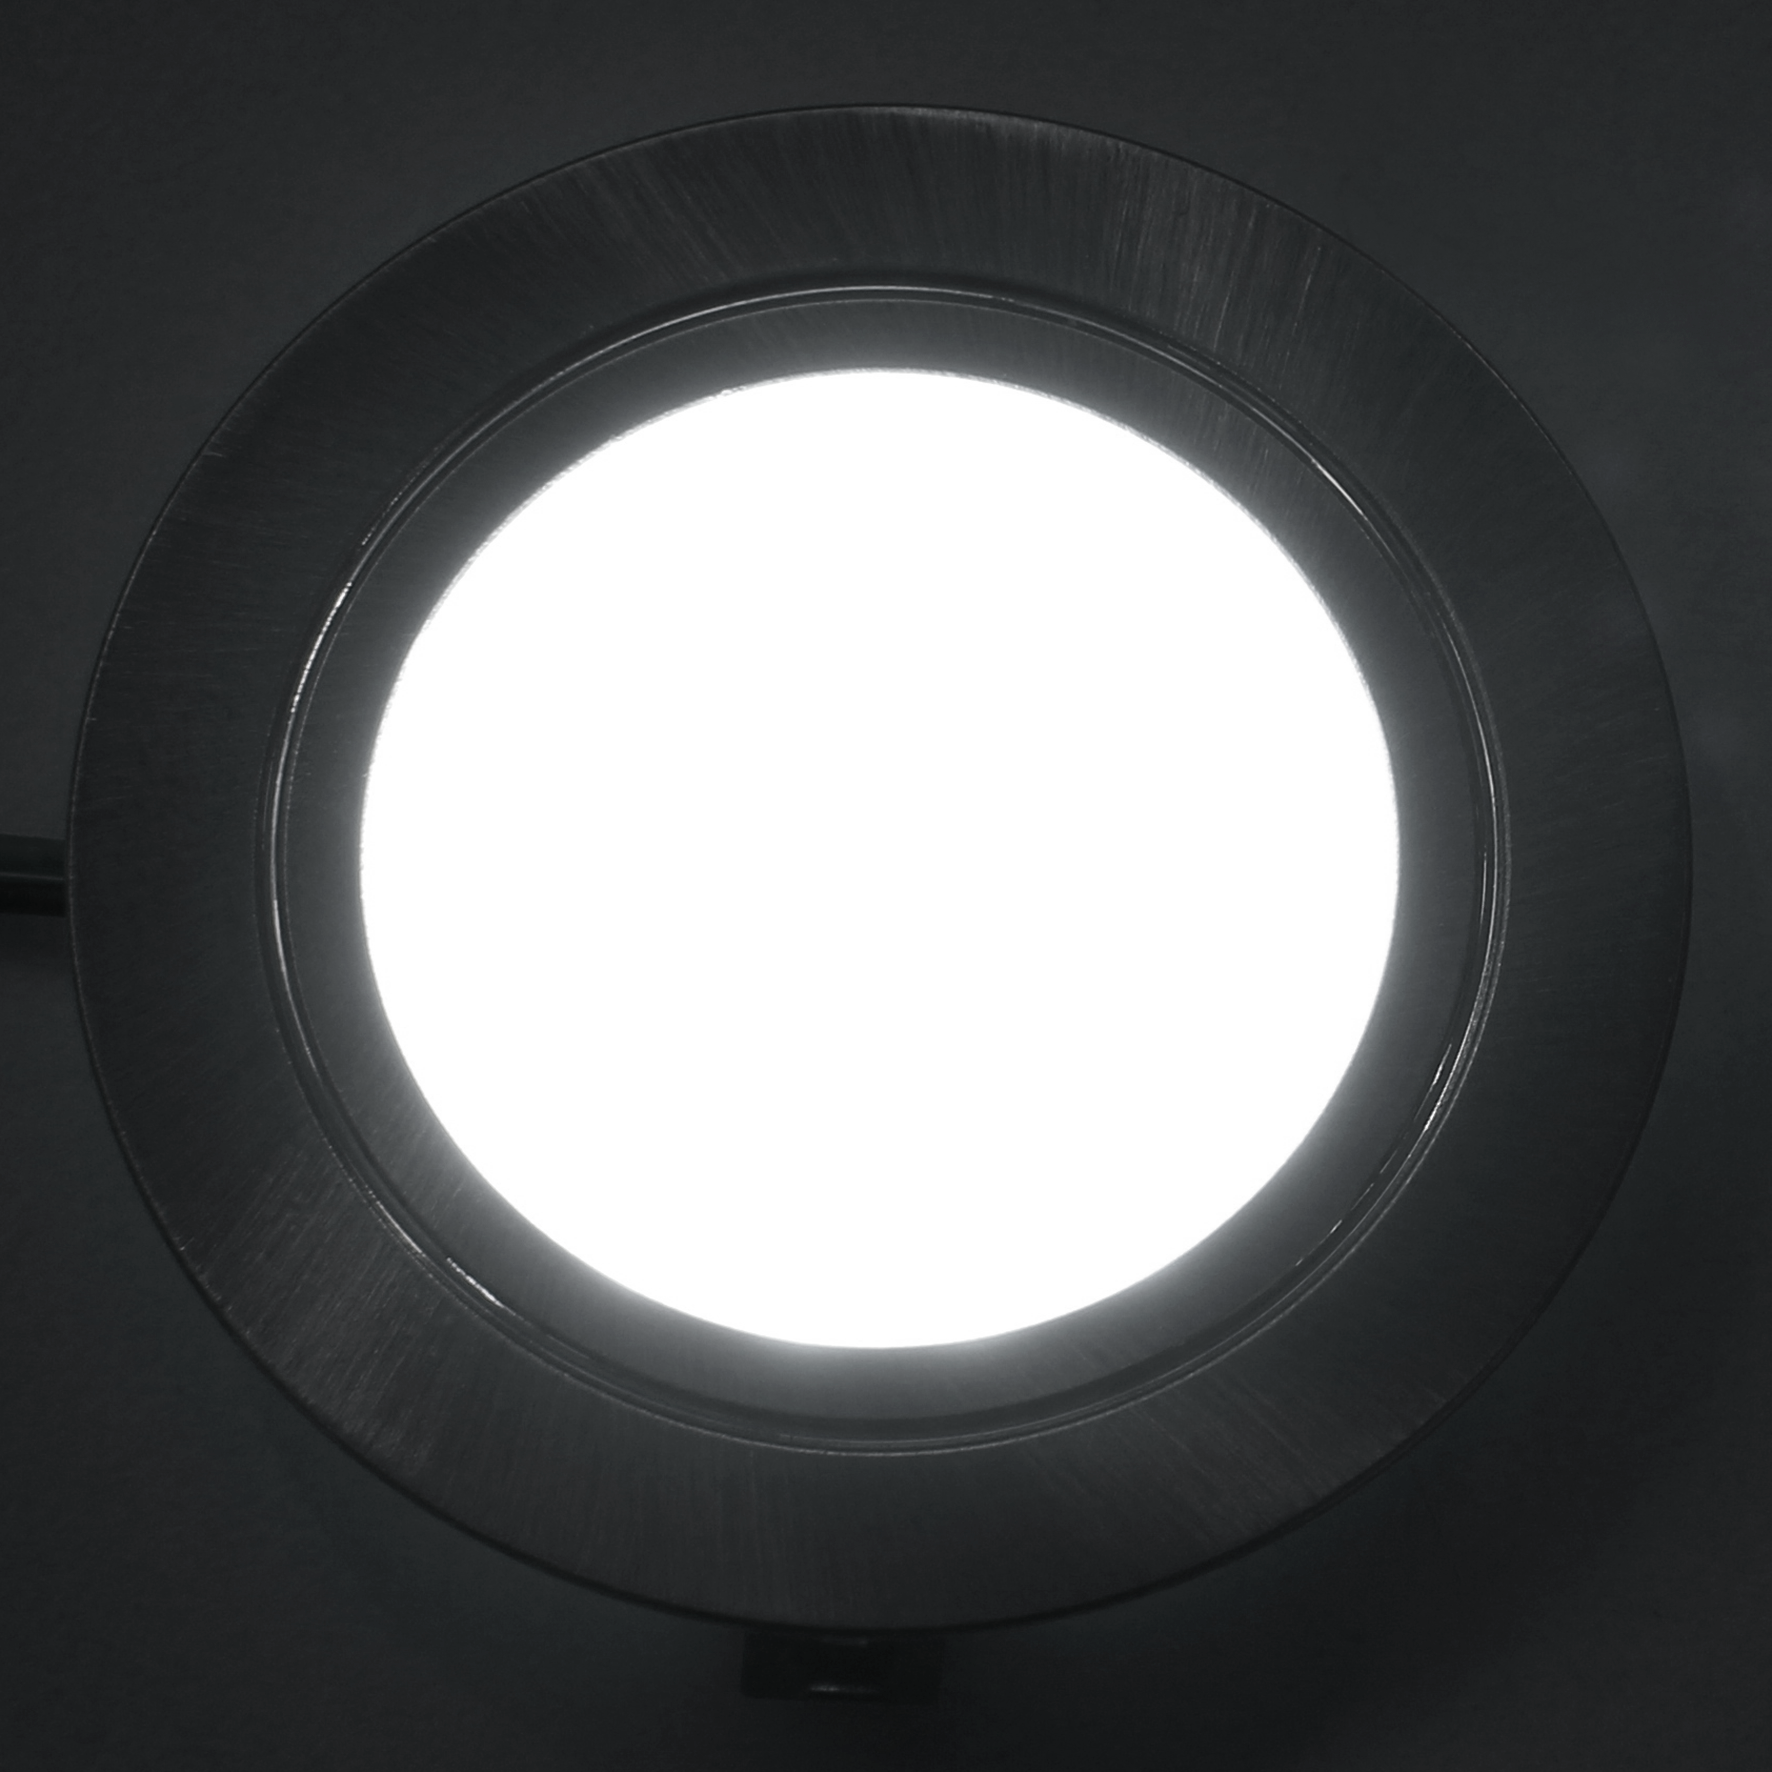 LED-Möbelleuchte McShine ''LM-12'' 2,4W, 160lm Ø65,5x10,7mm, neutralweiß